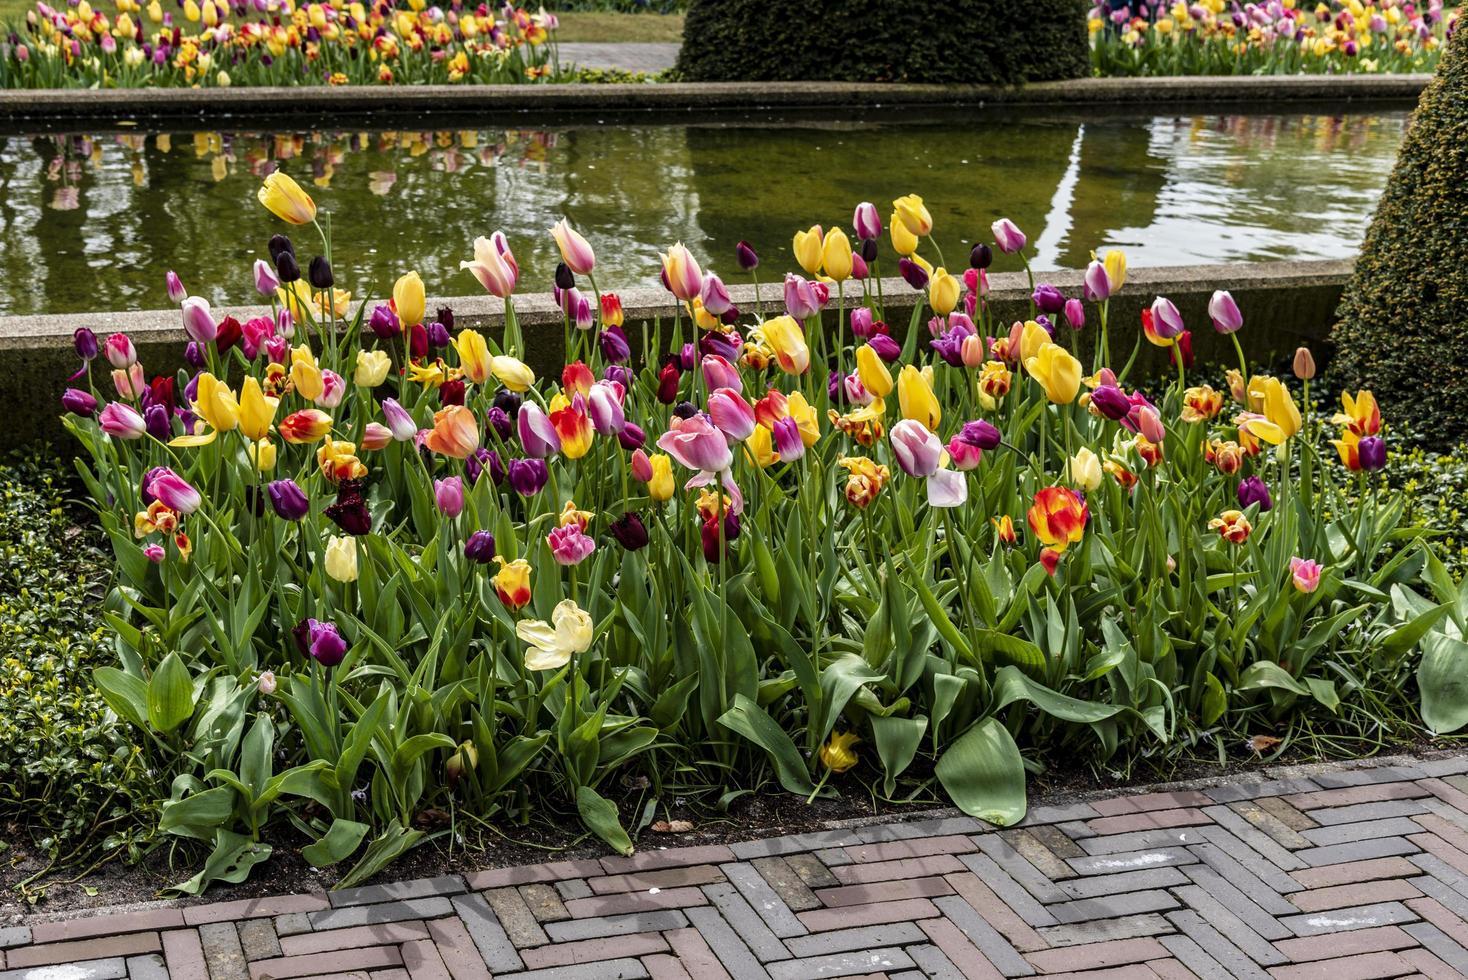 Frühlingstulpen in einem Gartenbett foto